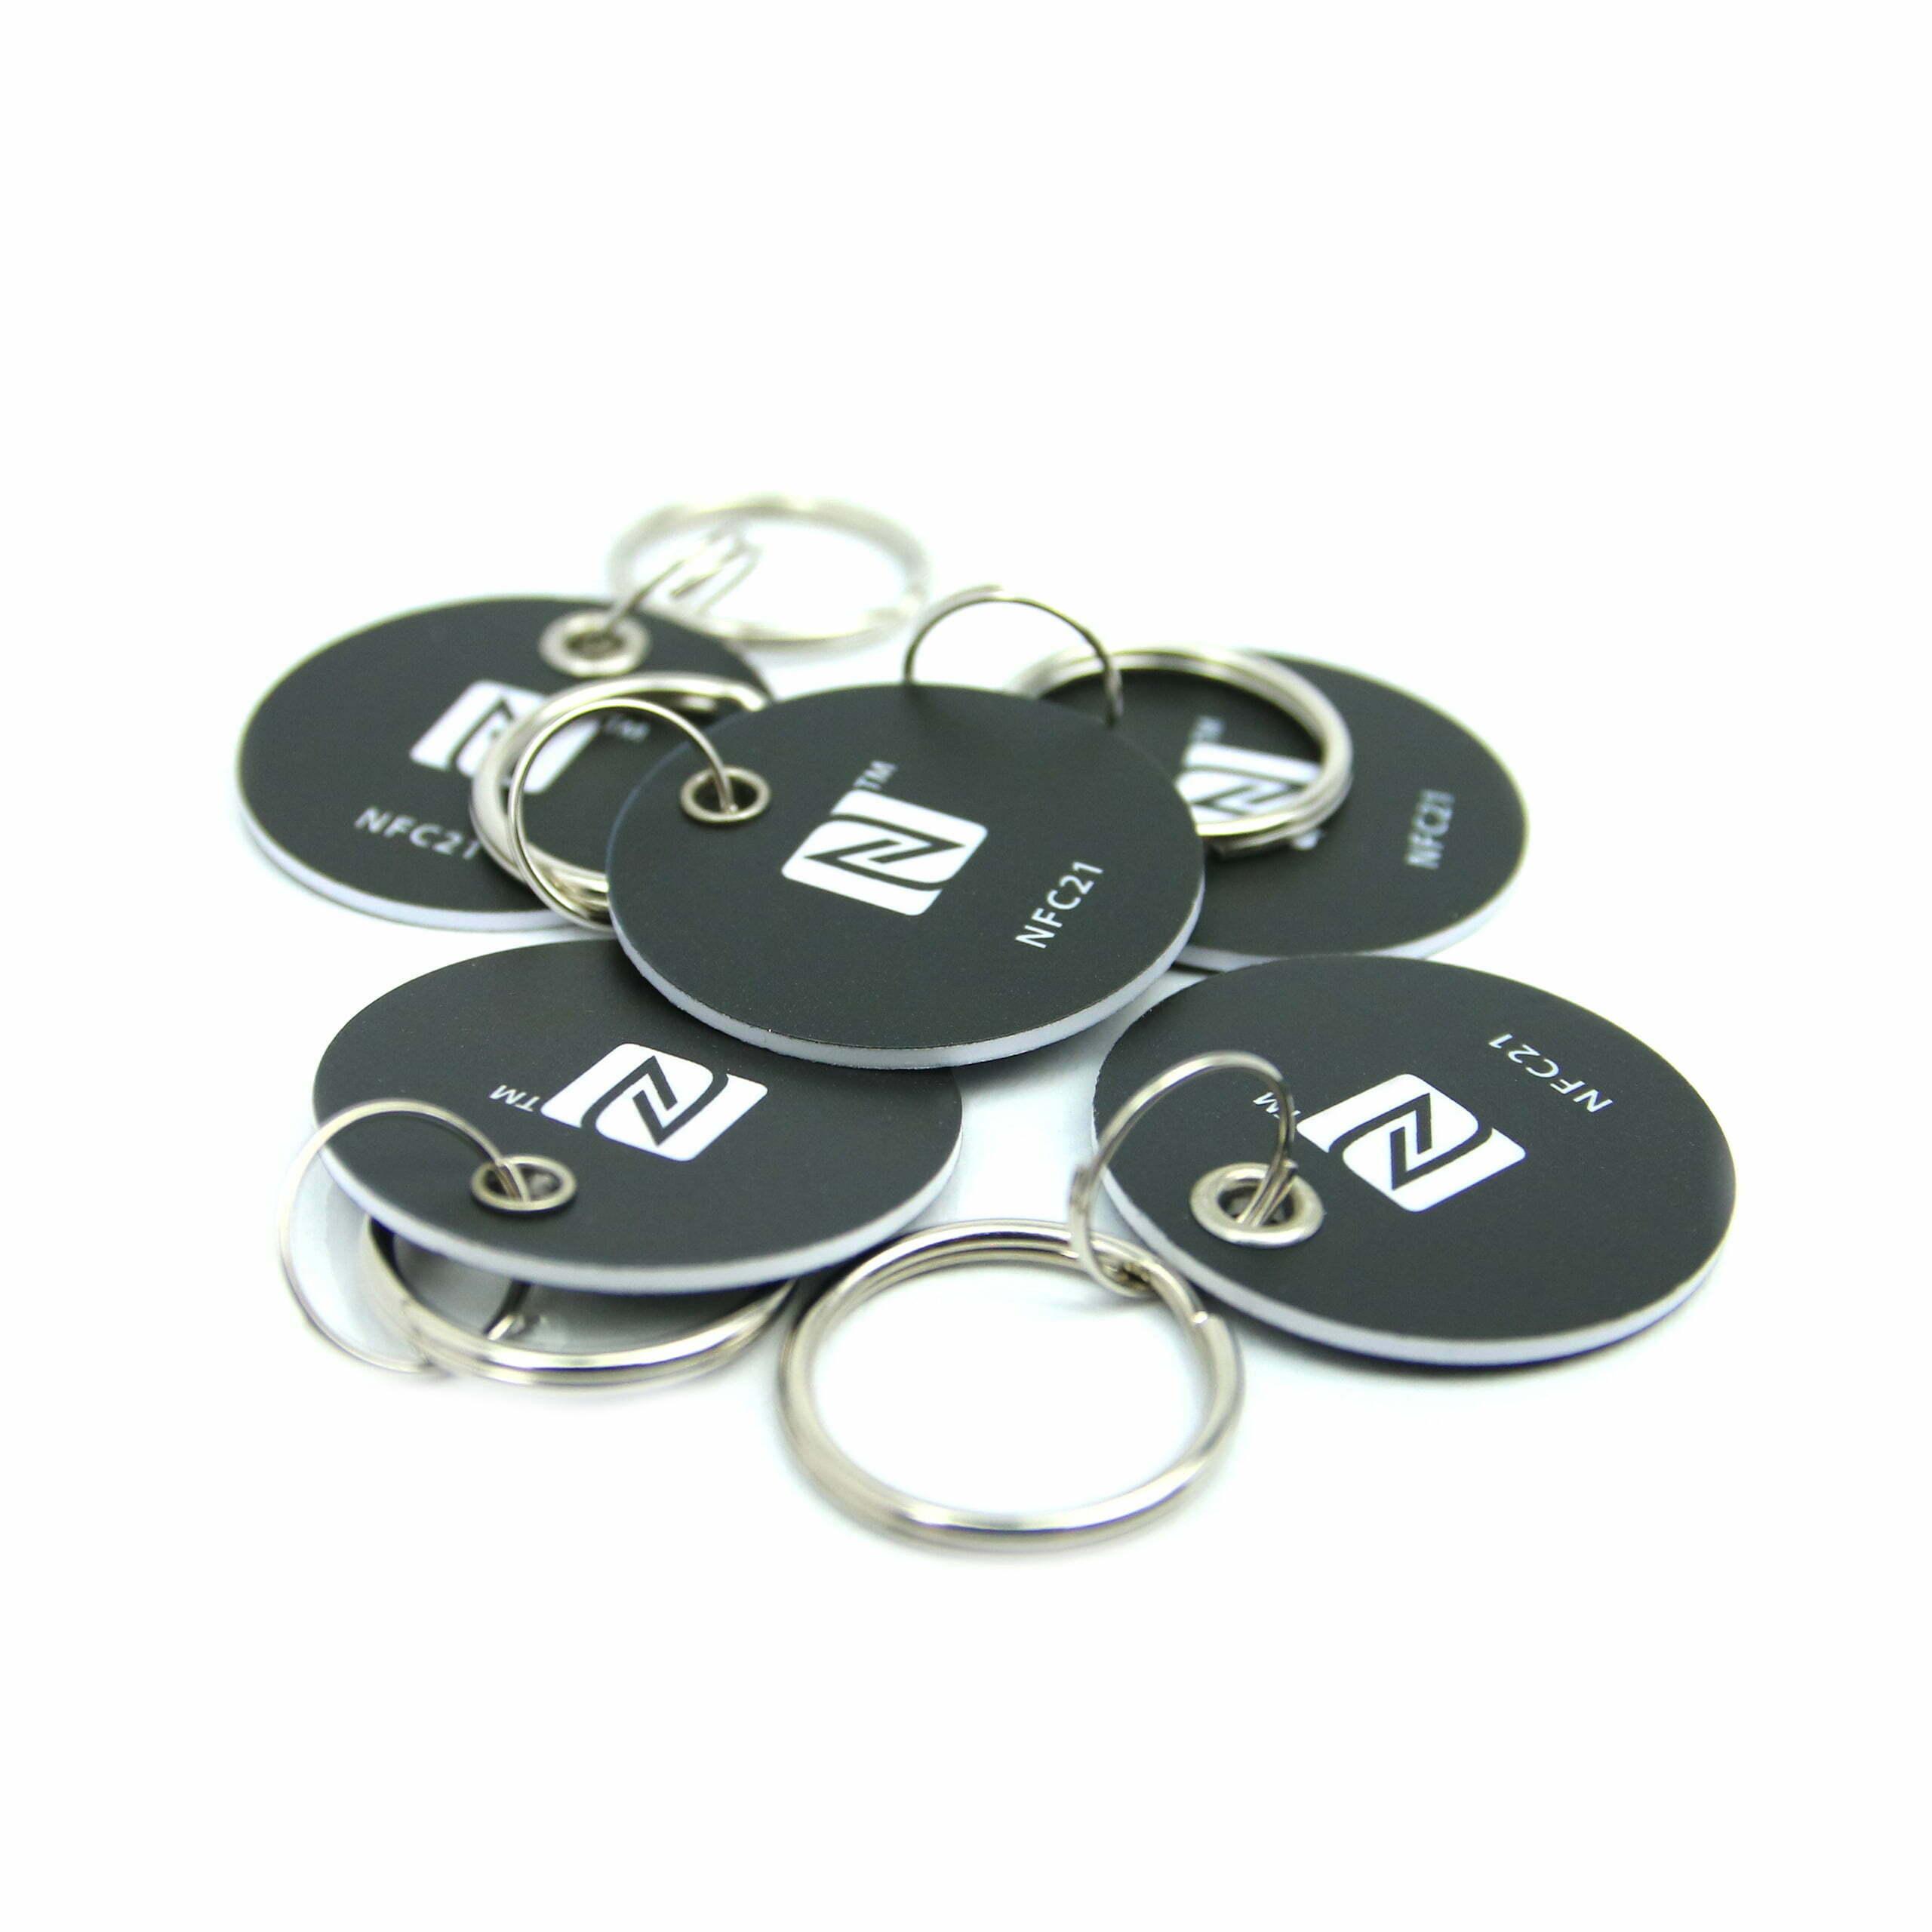 NFC Key Card, 30 mm, NTAG 213, 180 byte